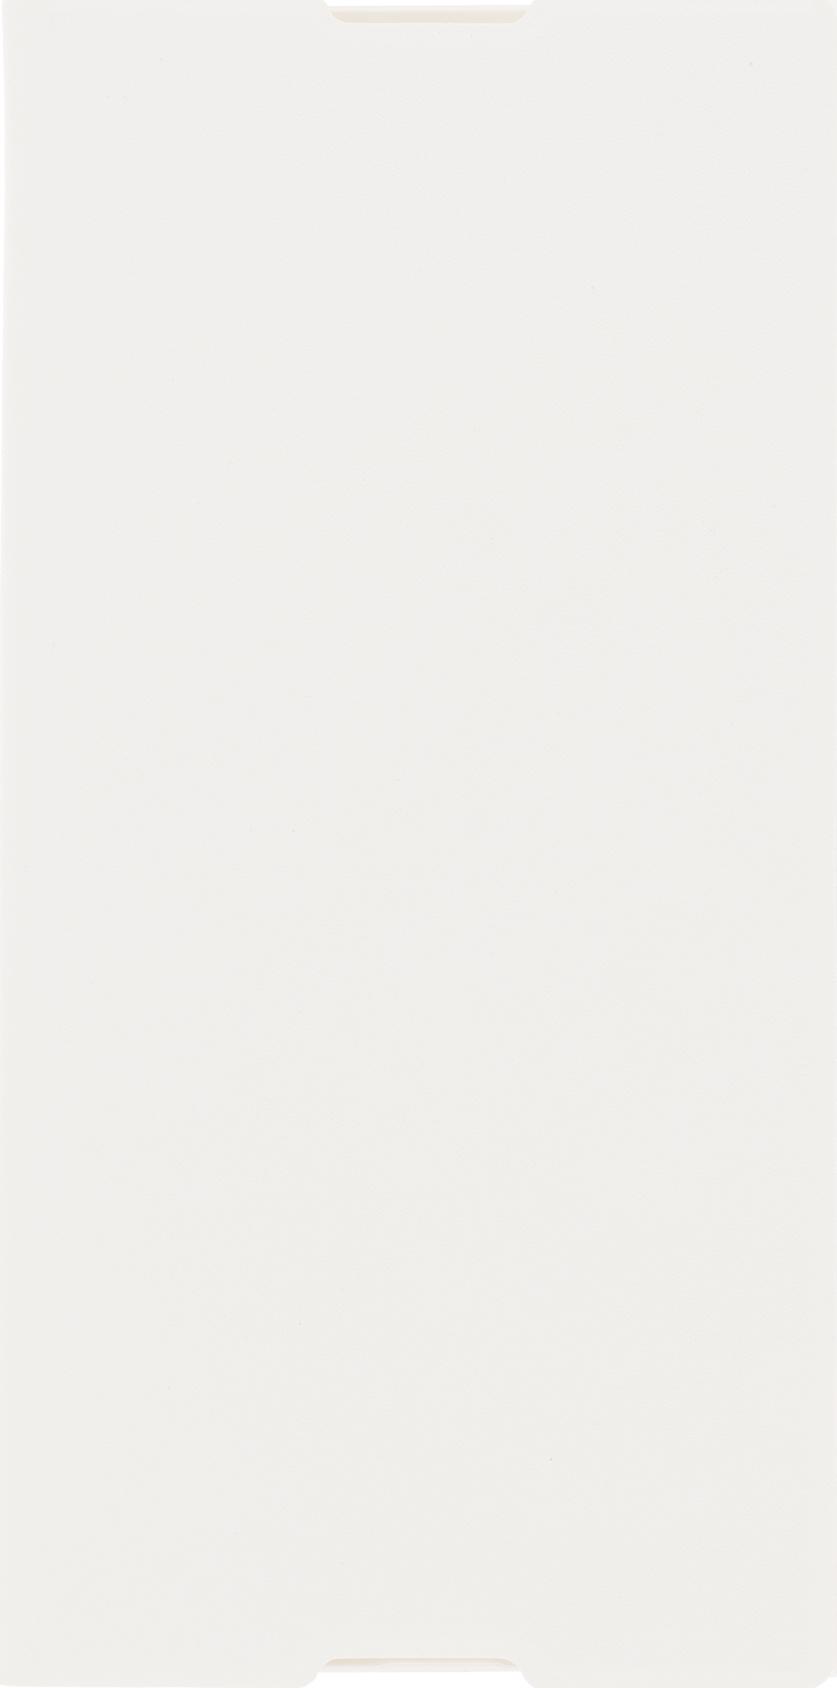 Чехол Brosco Book для Sony Xperia XA1 Ultra, белый смартфон sony xperia xa1 ultra dual 32 гб белый g3212white